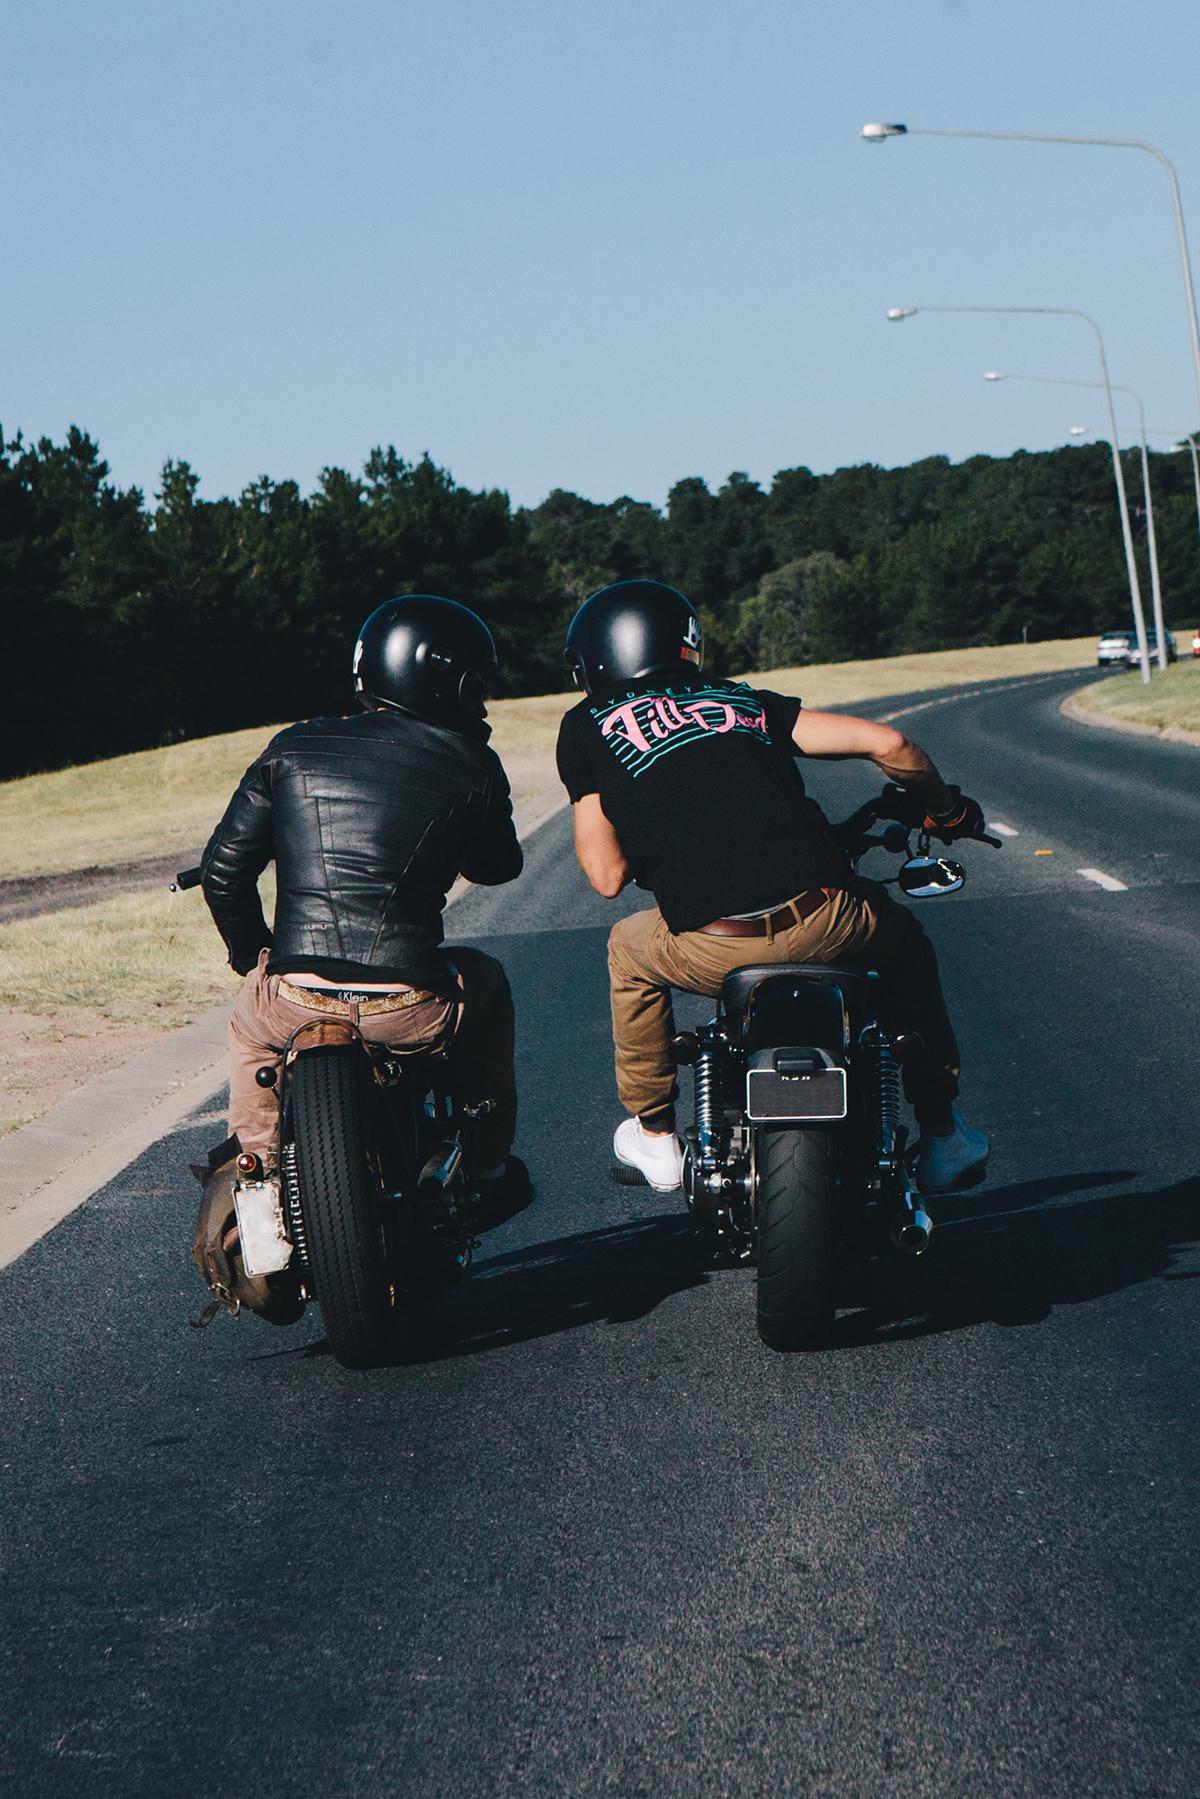 Ride_Till_Dead_Harley_Wheelie_Burnout20160706 (6)